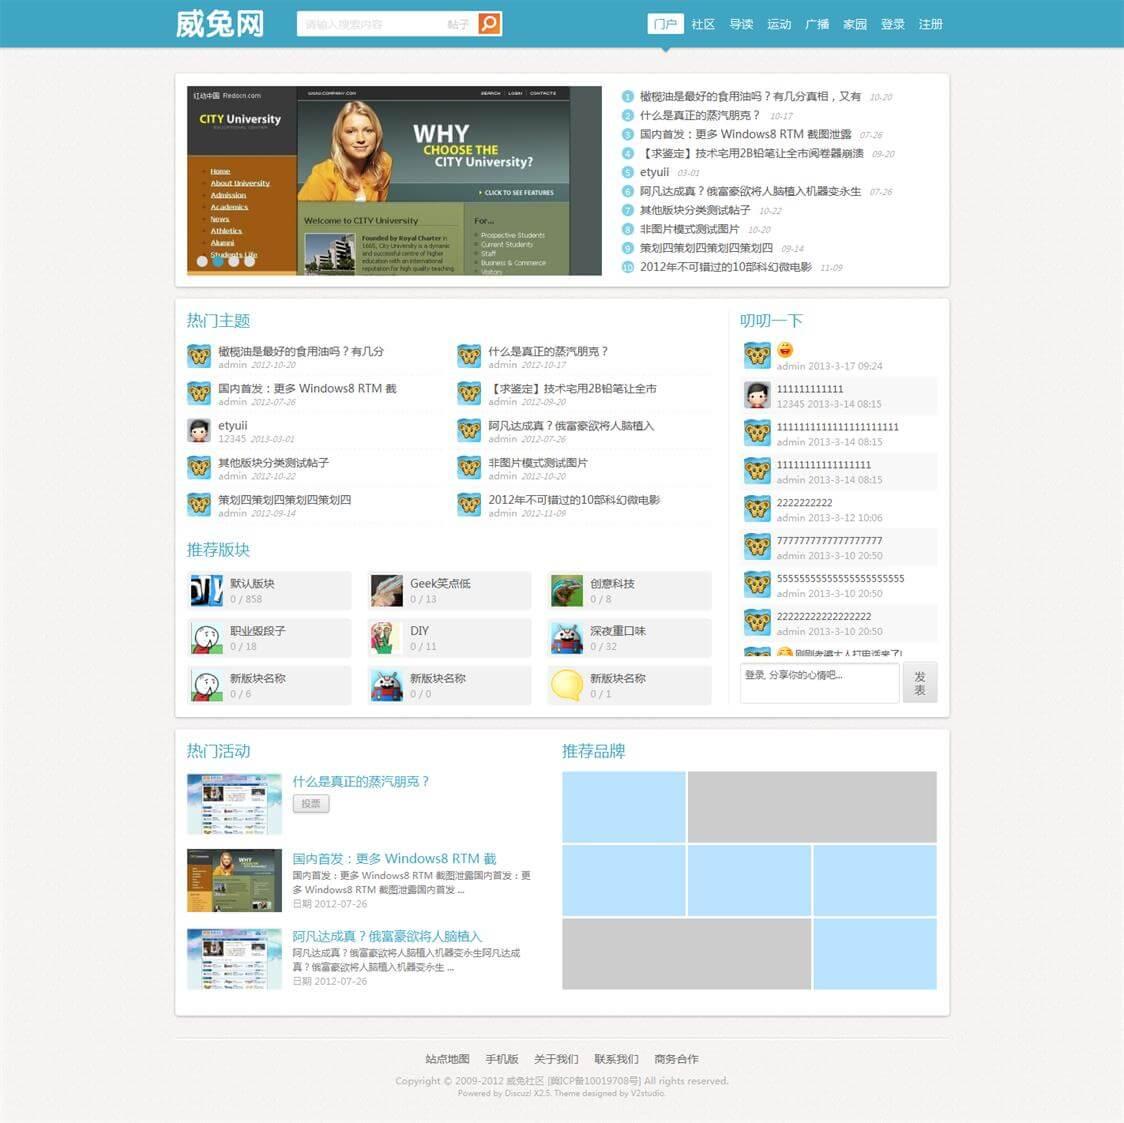 Discuz模板:GBK版轻论坛威兔模板免费分享